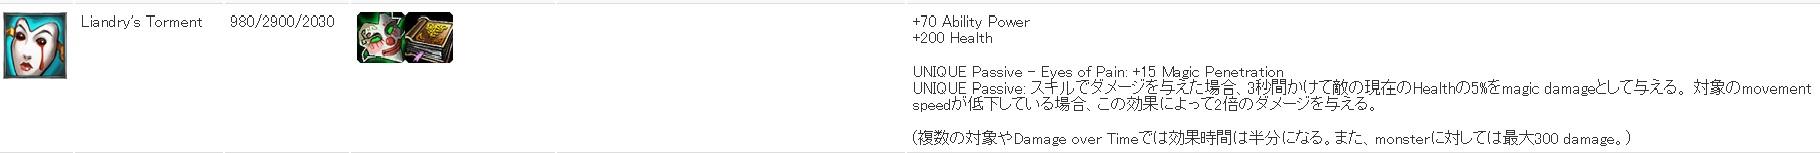 item19.jpg